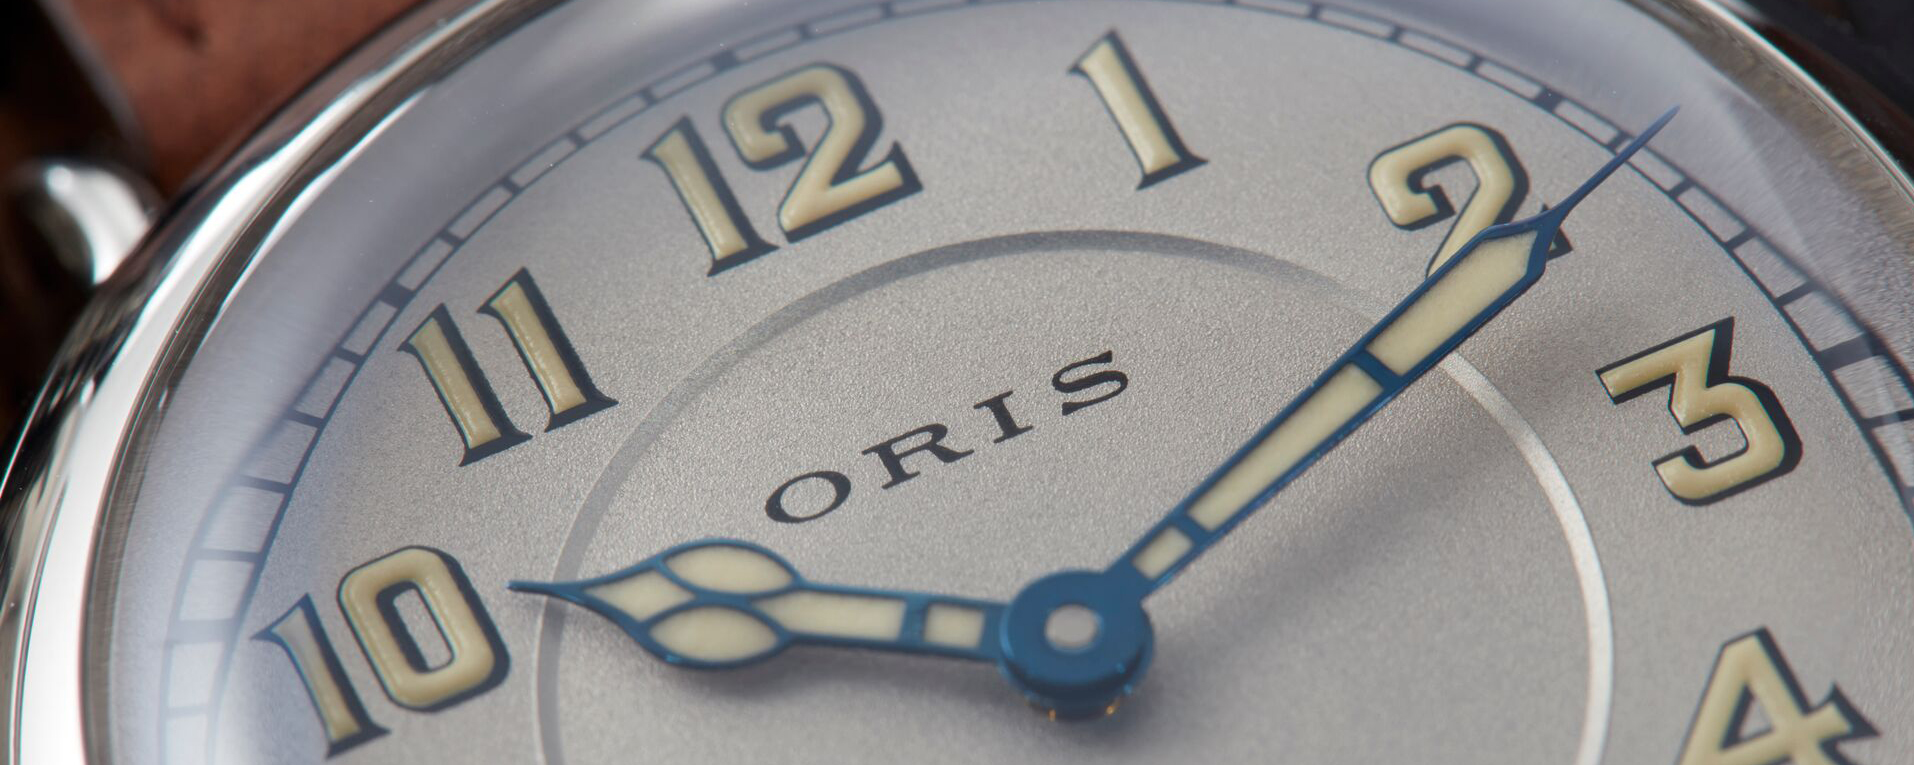 Oris_0183-copy.jpg